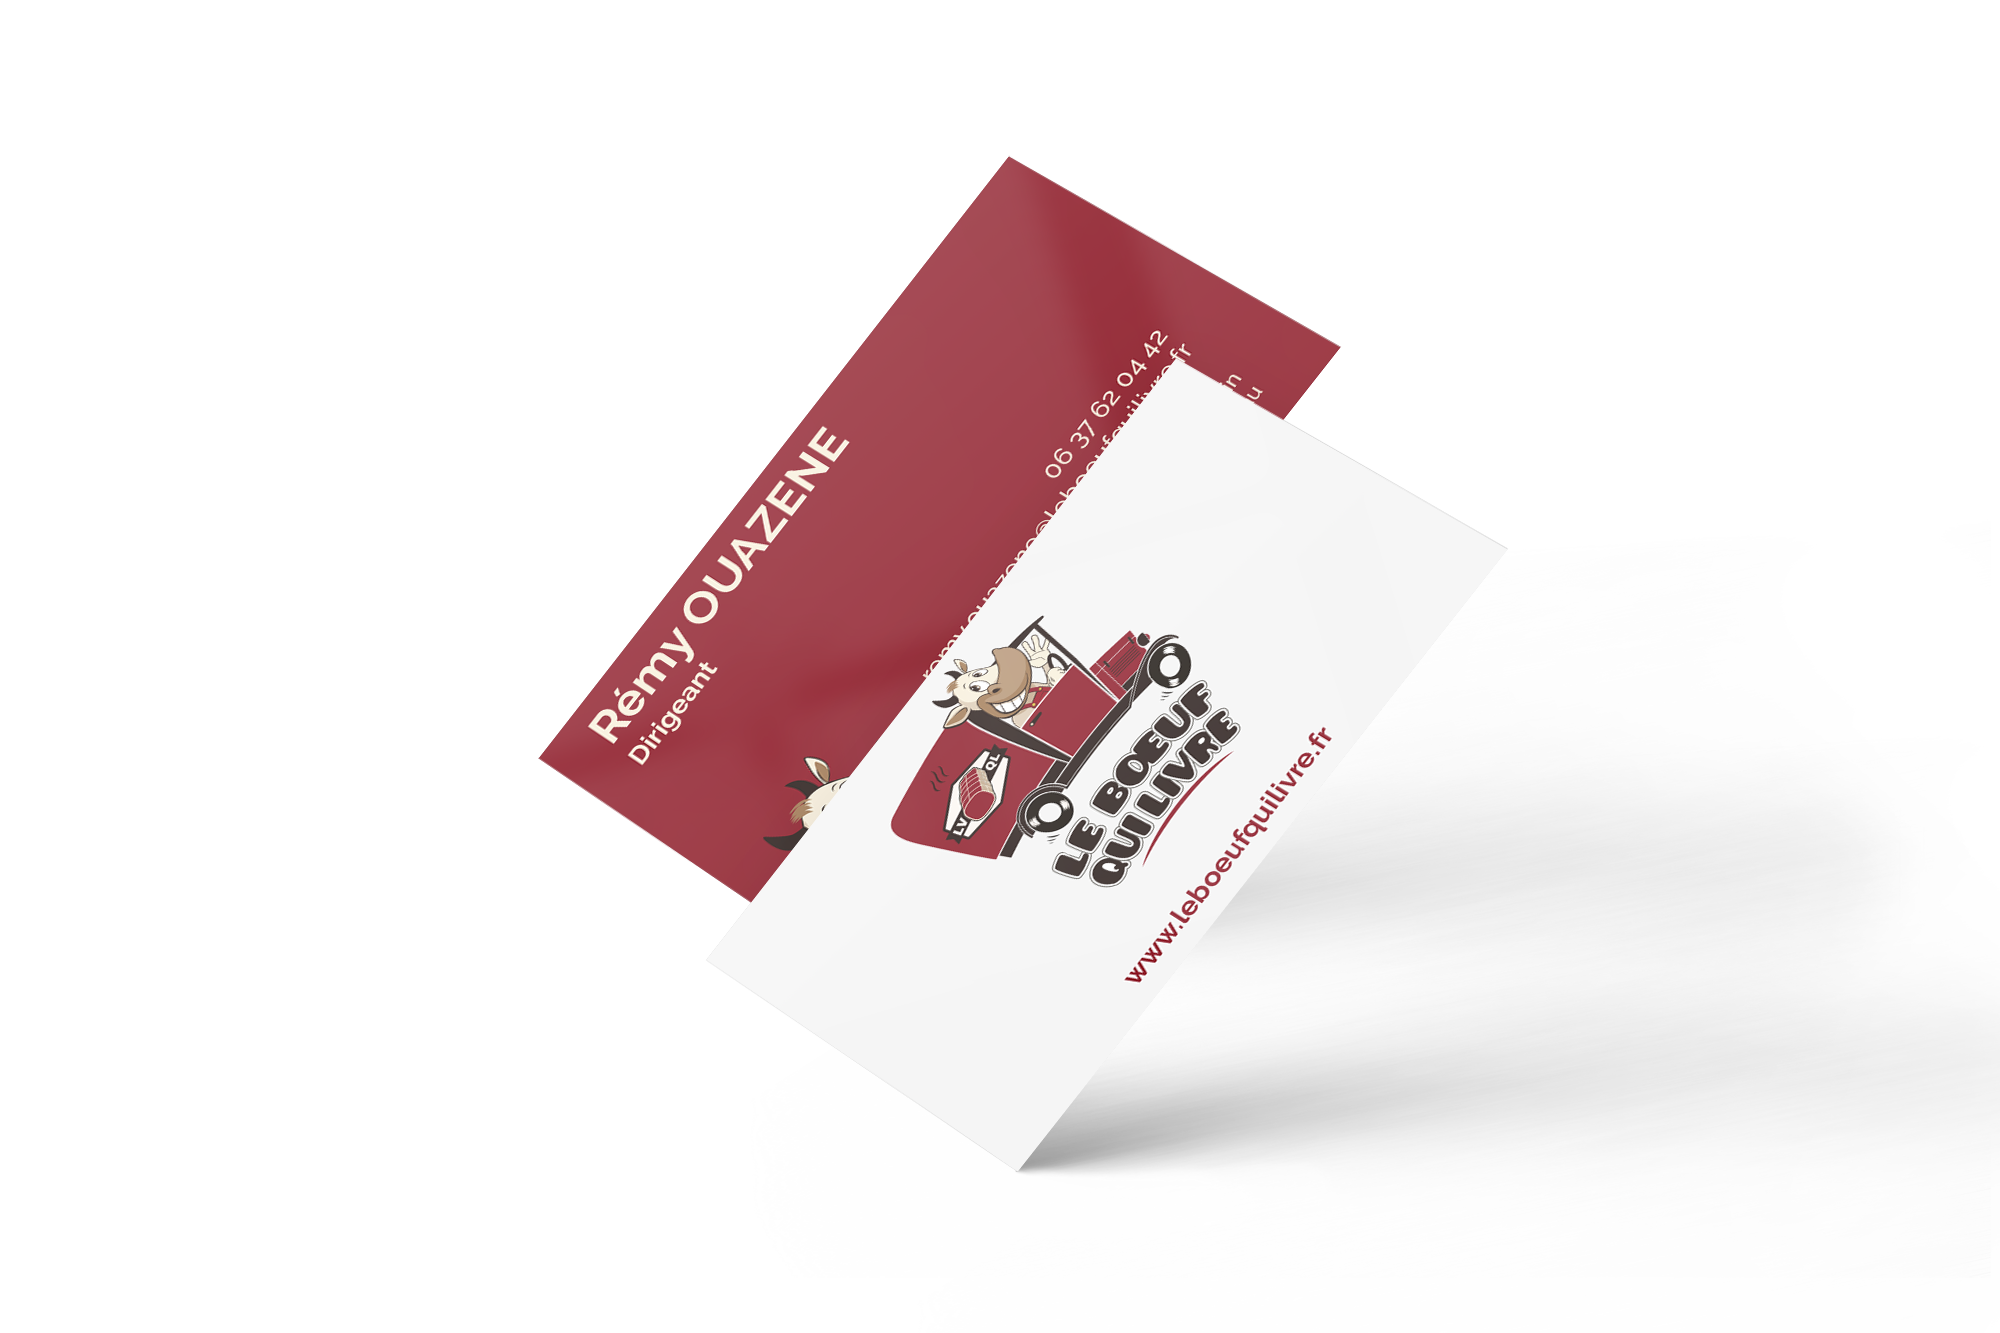 https://www.ikadia.fr/wp-content/uploads/2018/05/ikadia_agence_de_communication_projet_la-vache-qui-livre_cards